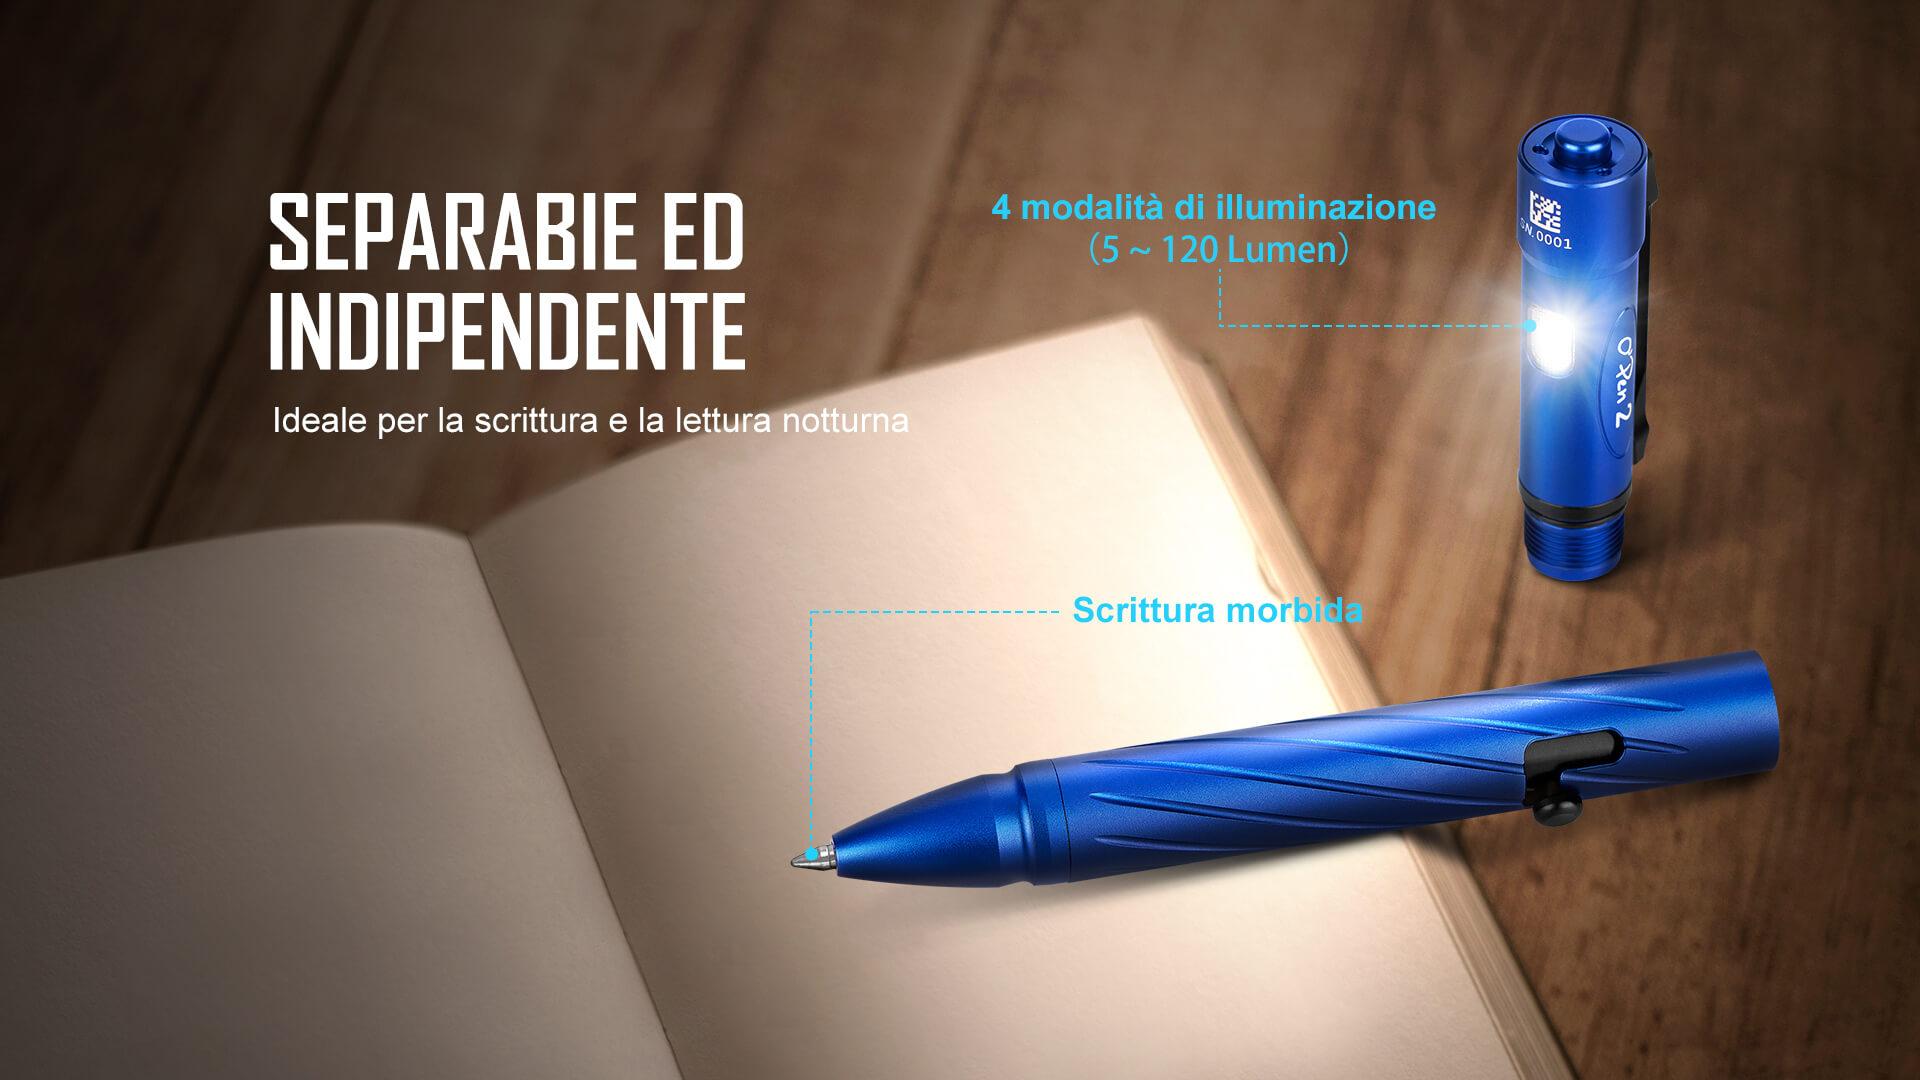 olight O pen 2, edc